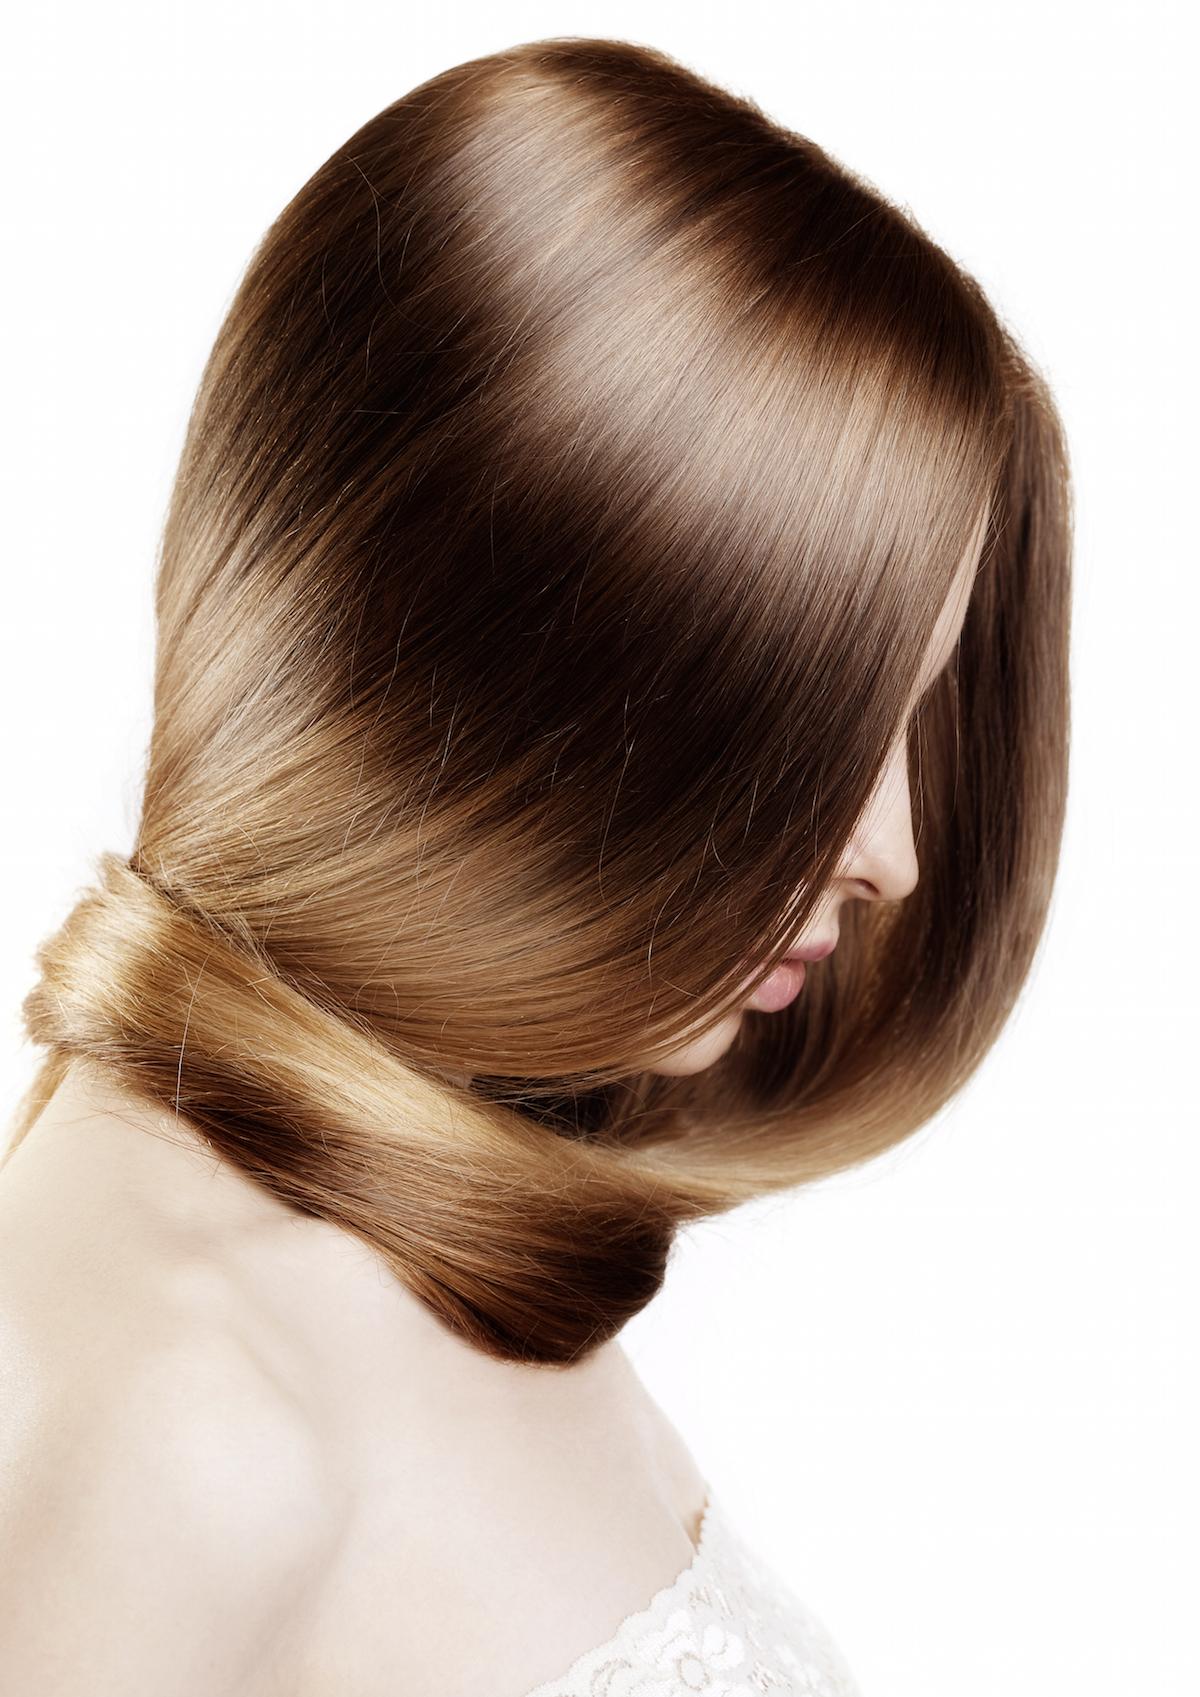 Young beautiful woman with luxurious hair via Shutterstock